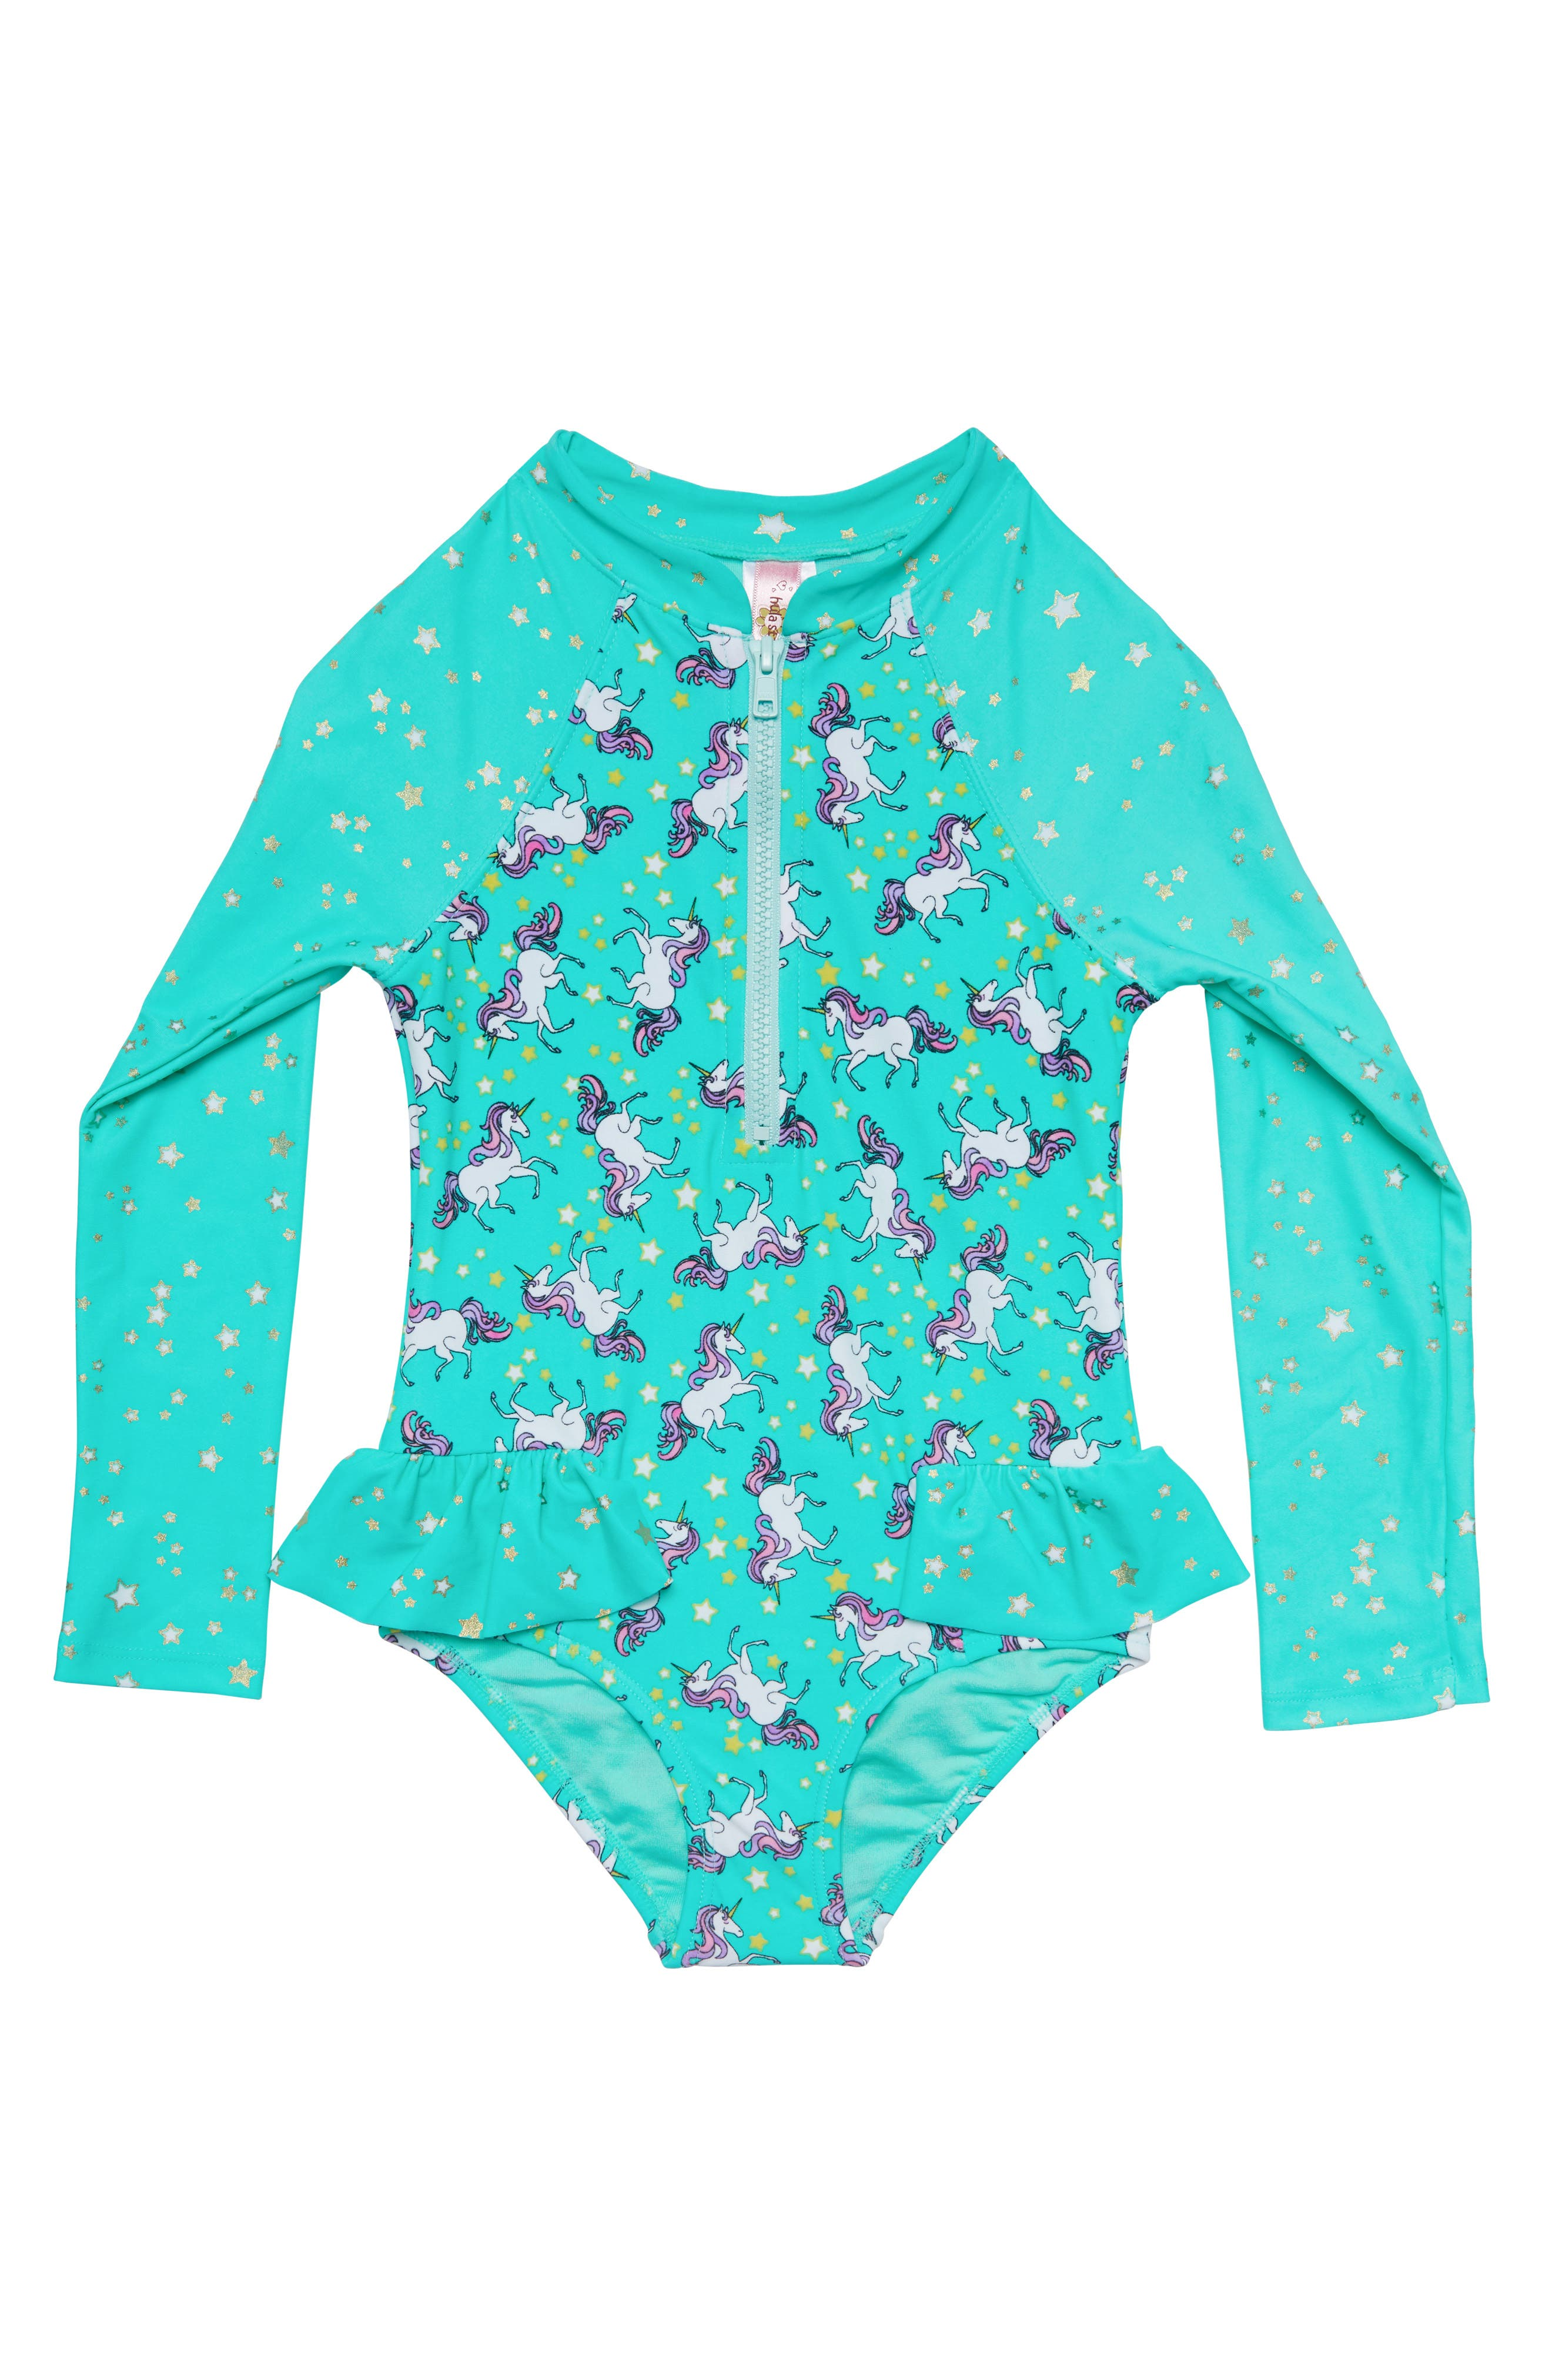 Stardust Dream One-Piece Rashguard Swimsuit,                         Main,                         color, MERMAID BLUE